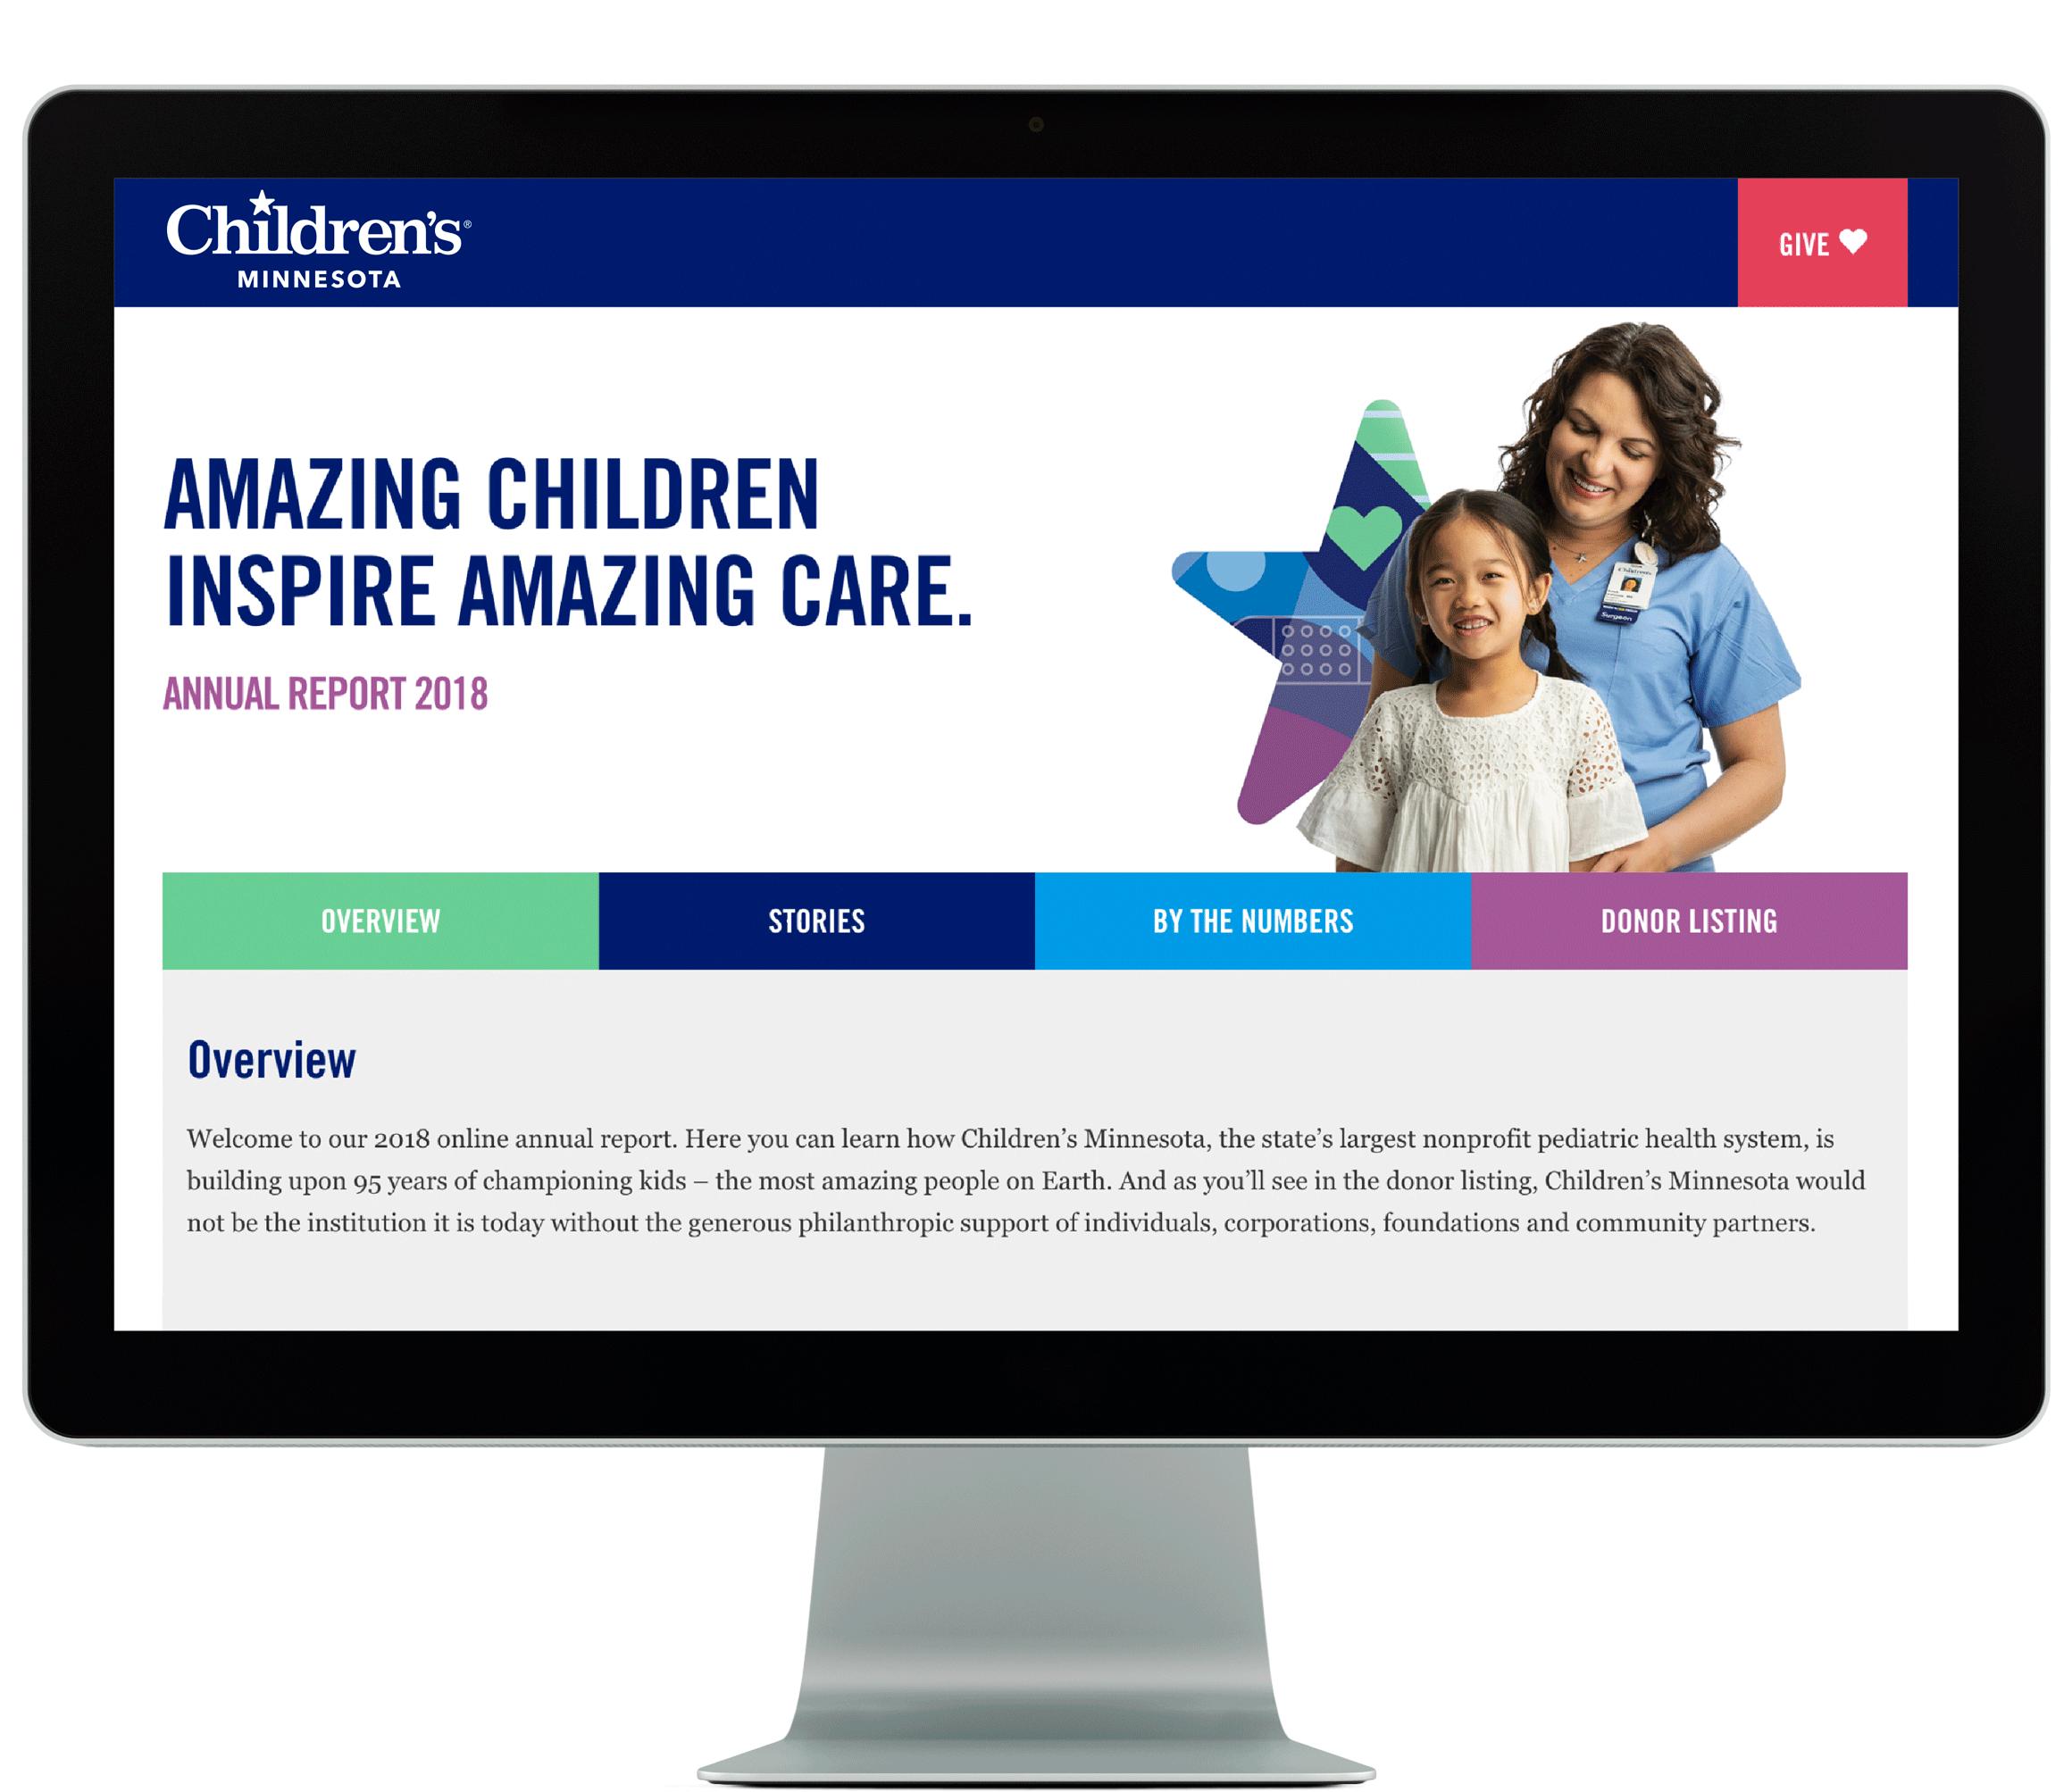 childrens-minnesota-annual-report.jpg